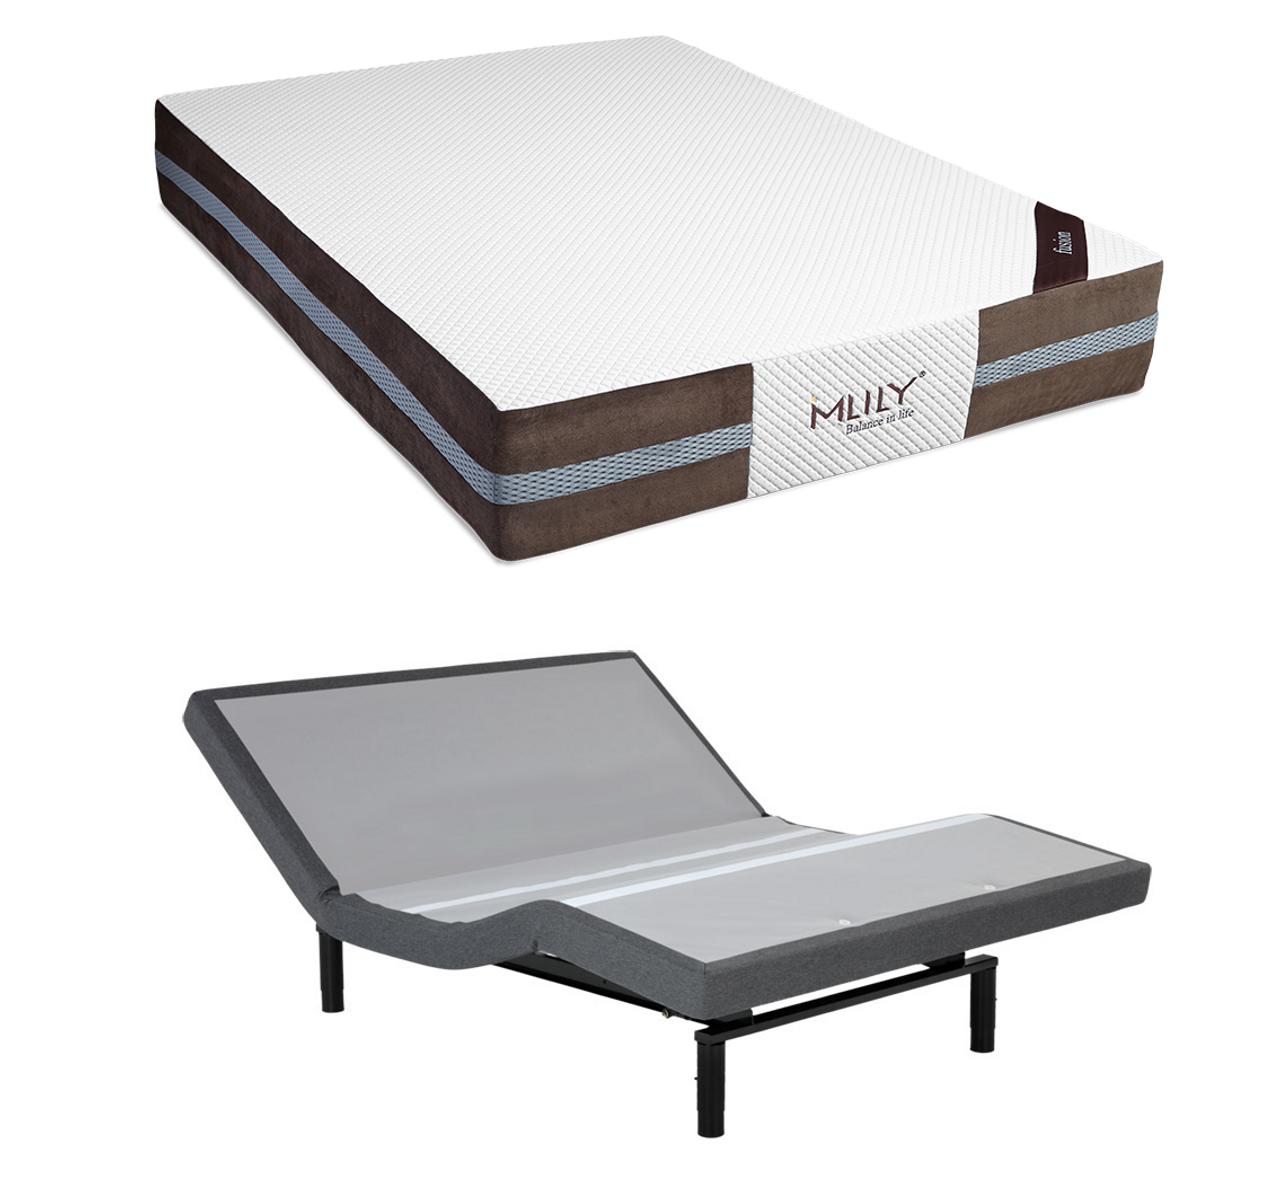 Serta Icomfort Reviews >> MLily Fusion Hybrid Latex Mattress with Leggett & Platt S-Cape 2.0 Adjustable Base Set ...